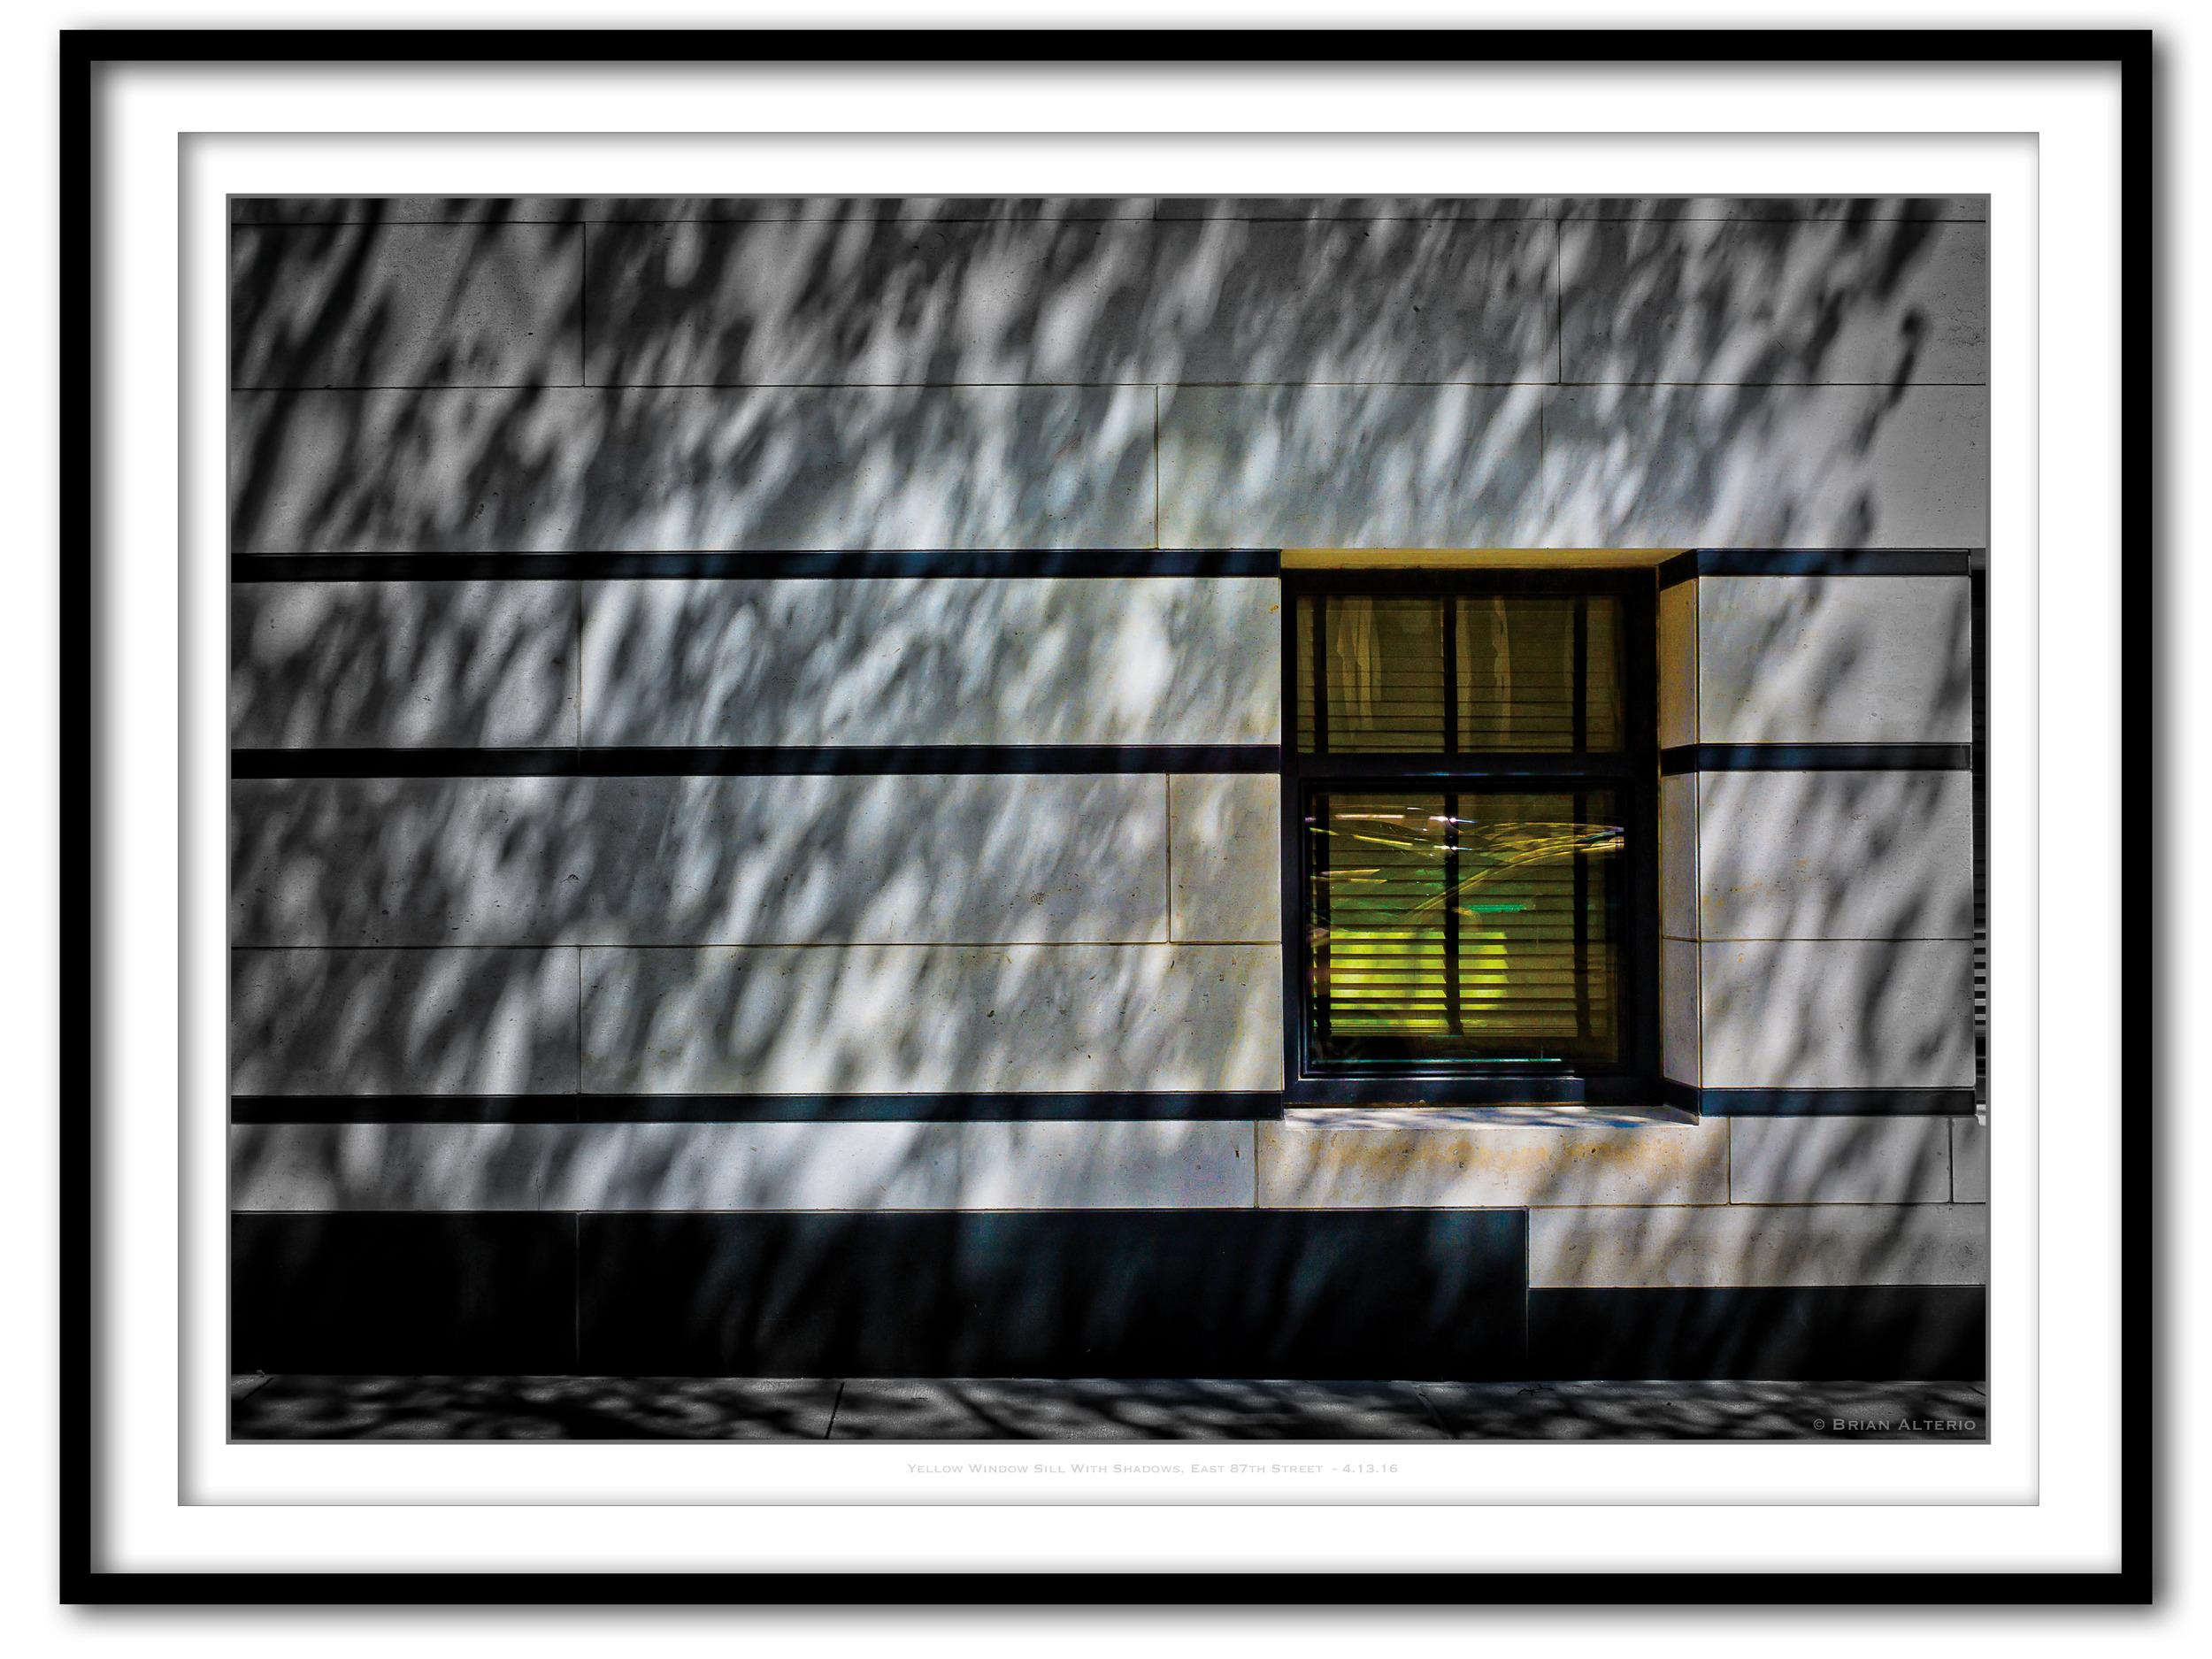 Yellow Window Sill With Shadows, East 87th Street  - 4.13.16 - Framed.jpg